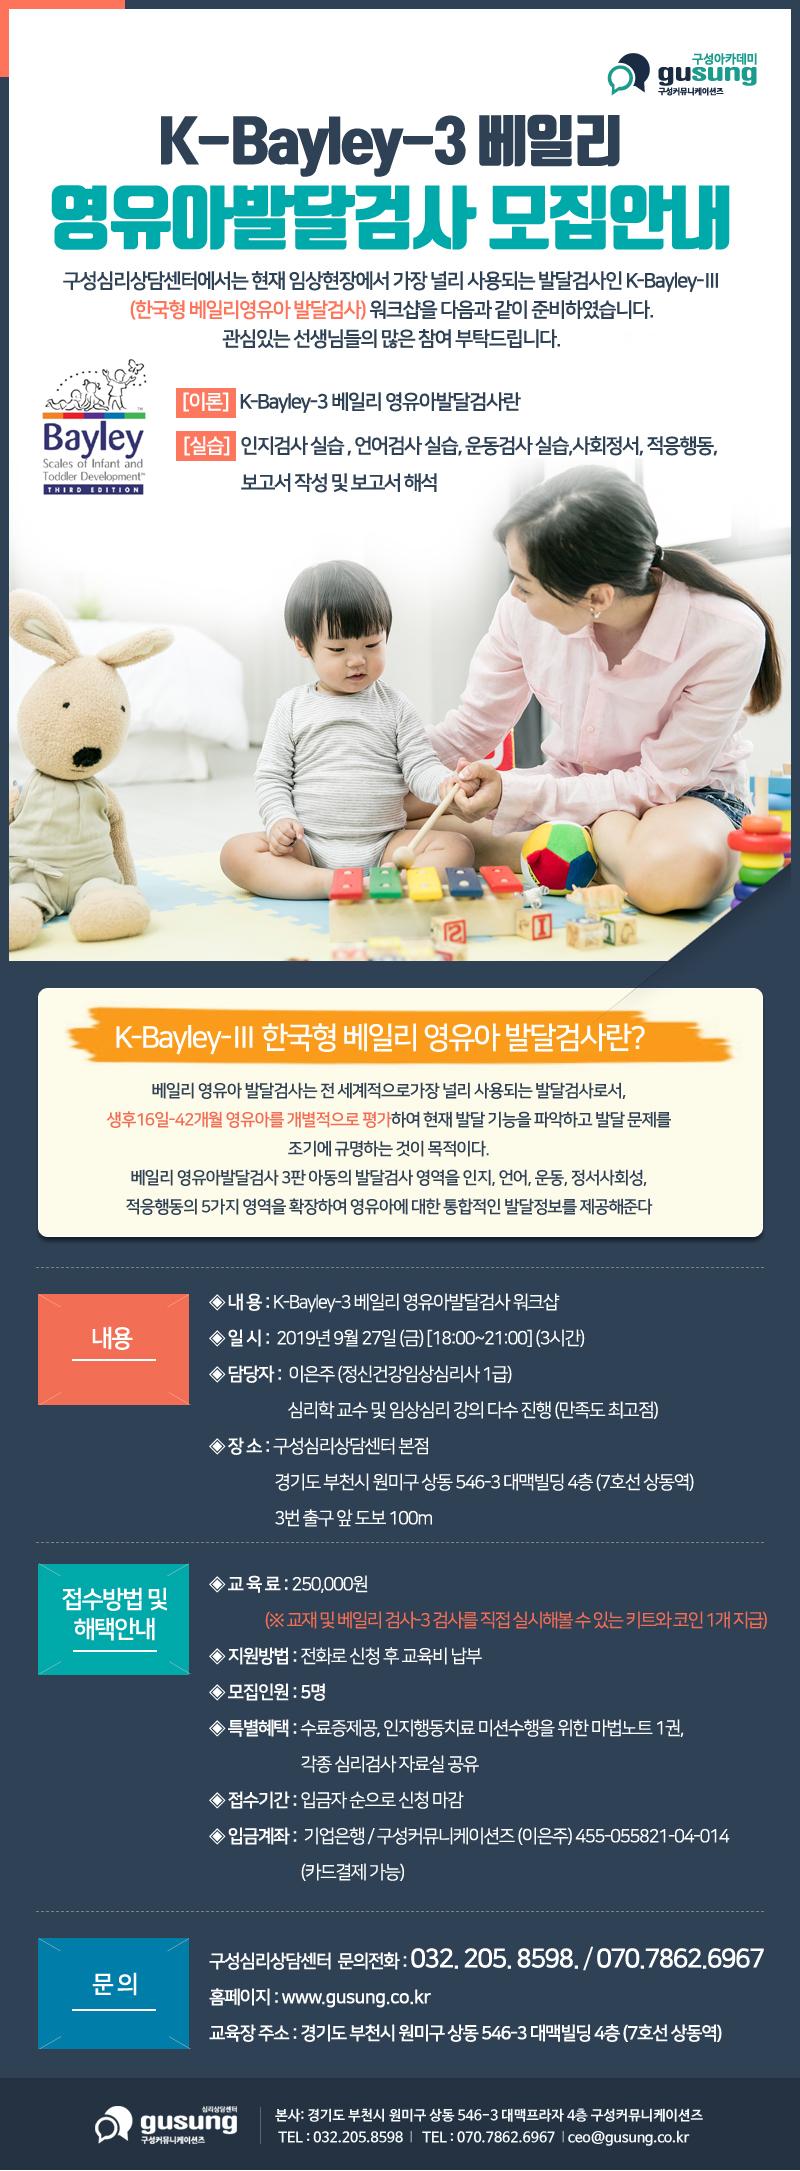 ▣ K-Bayley-3 베일리 영유아발달검사 모집안내 9월.jpg